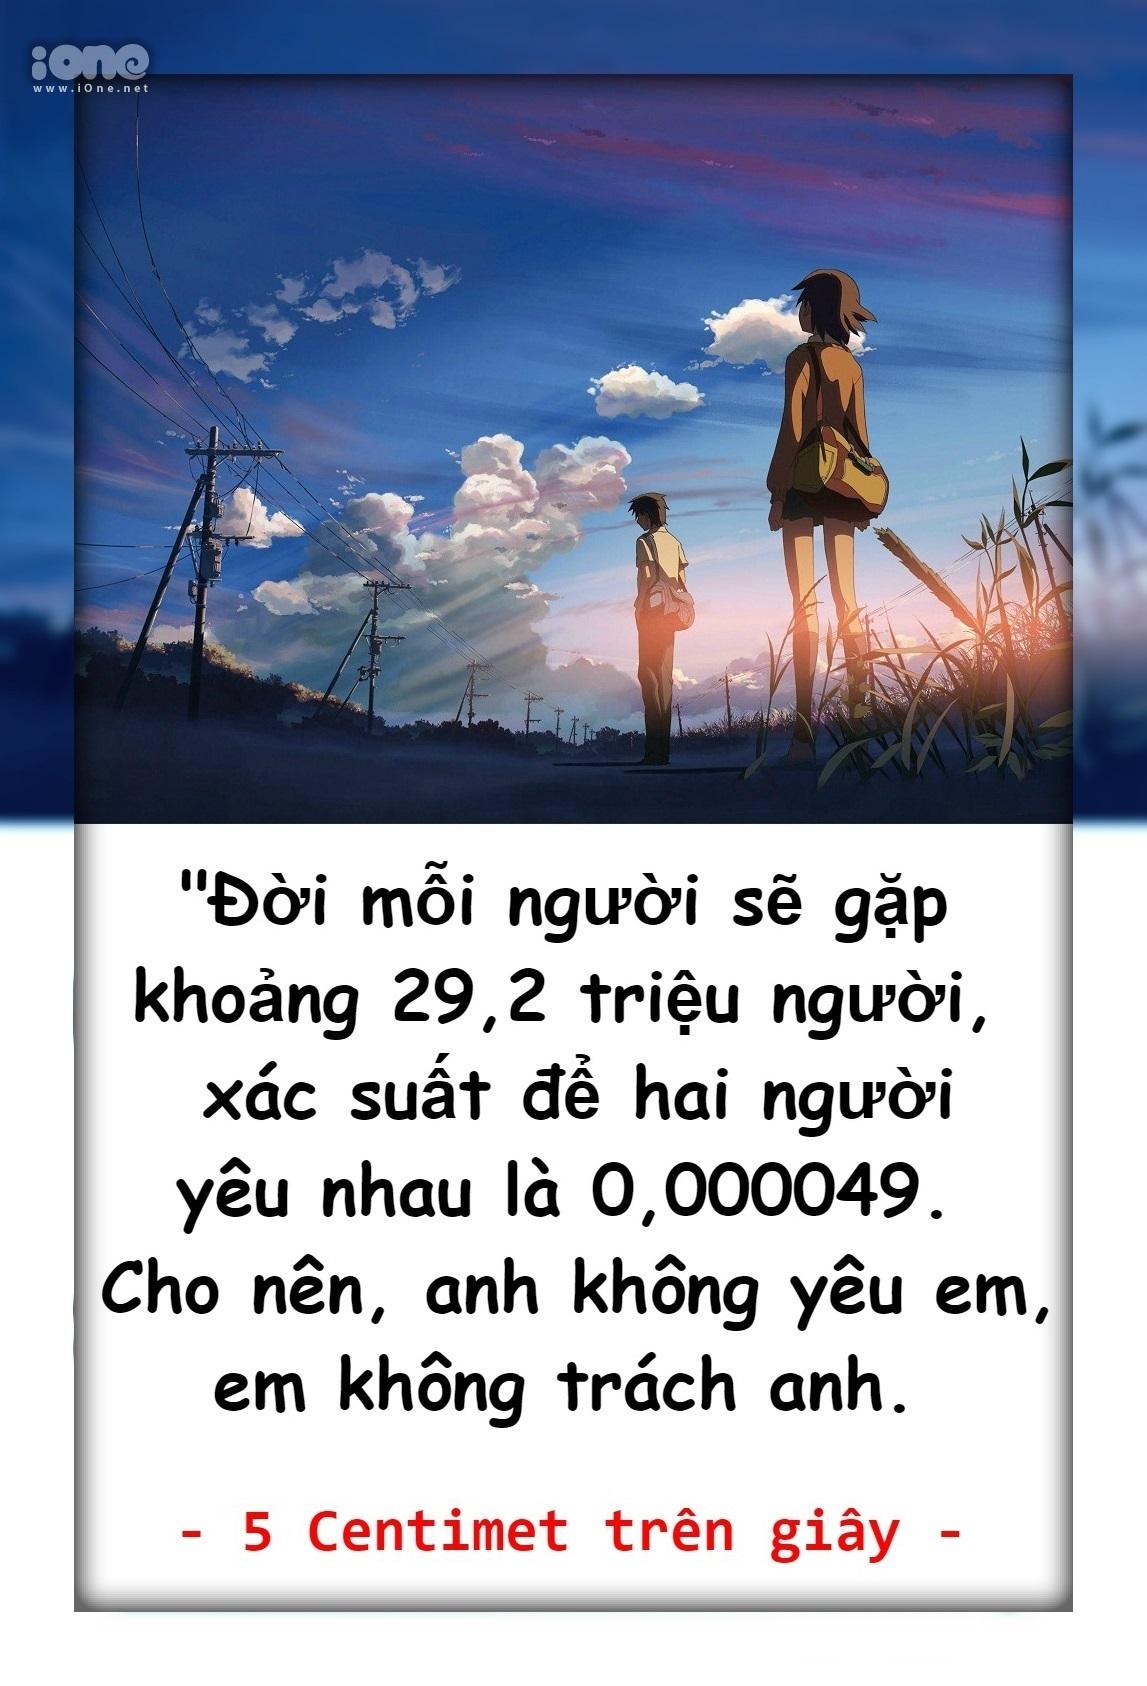 3_1551360203_VnEx.jpg